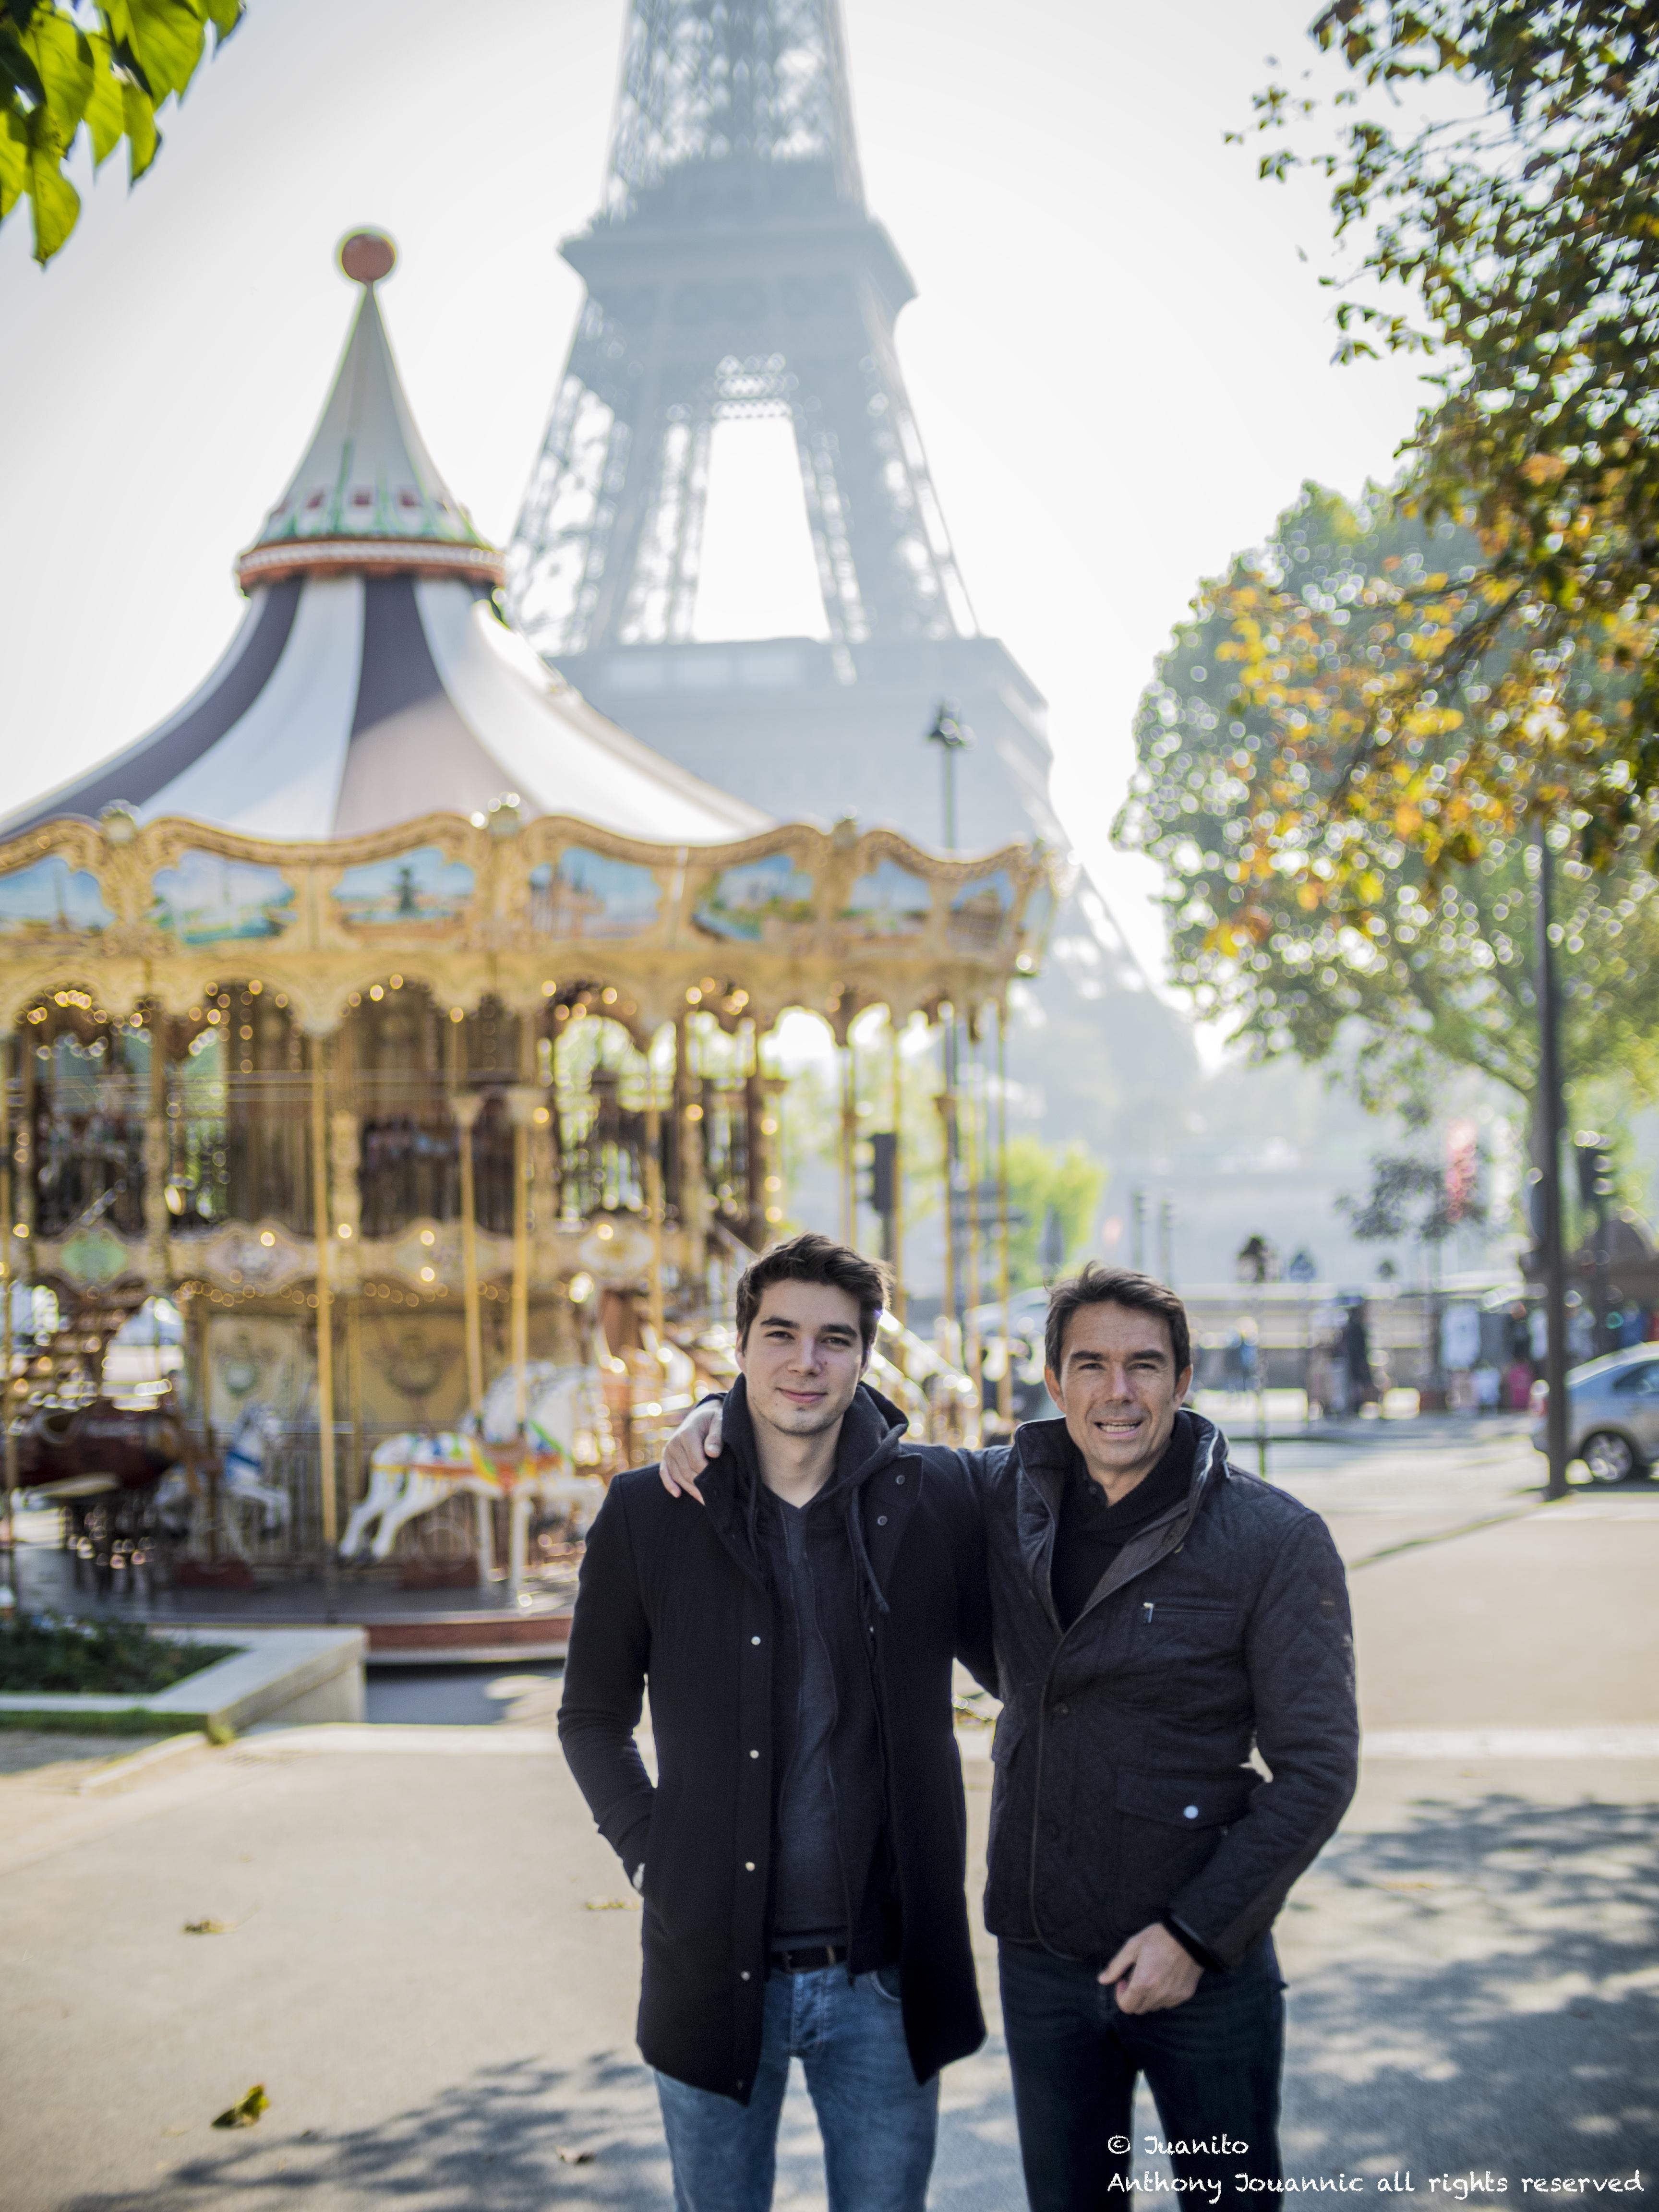 Parisian stereotype